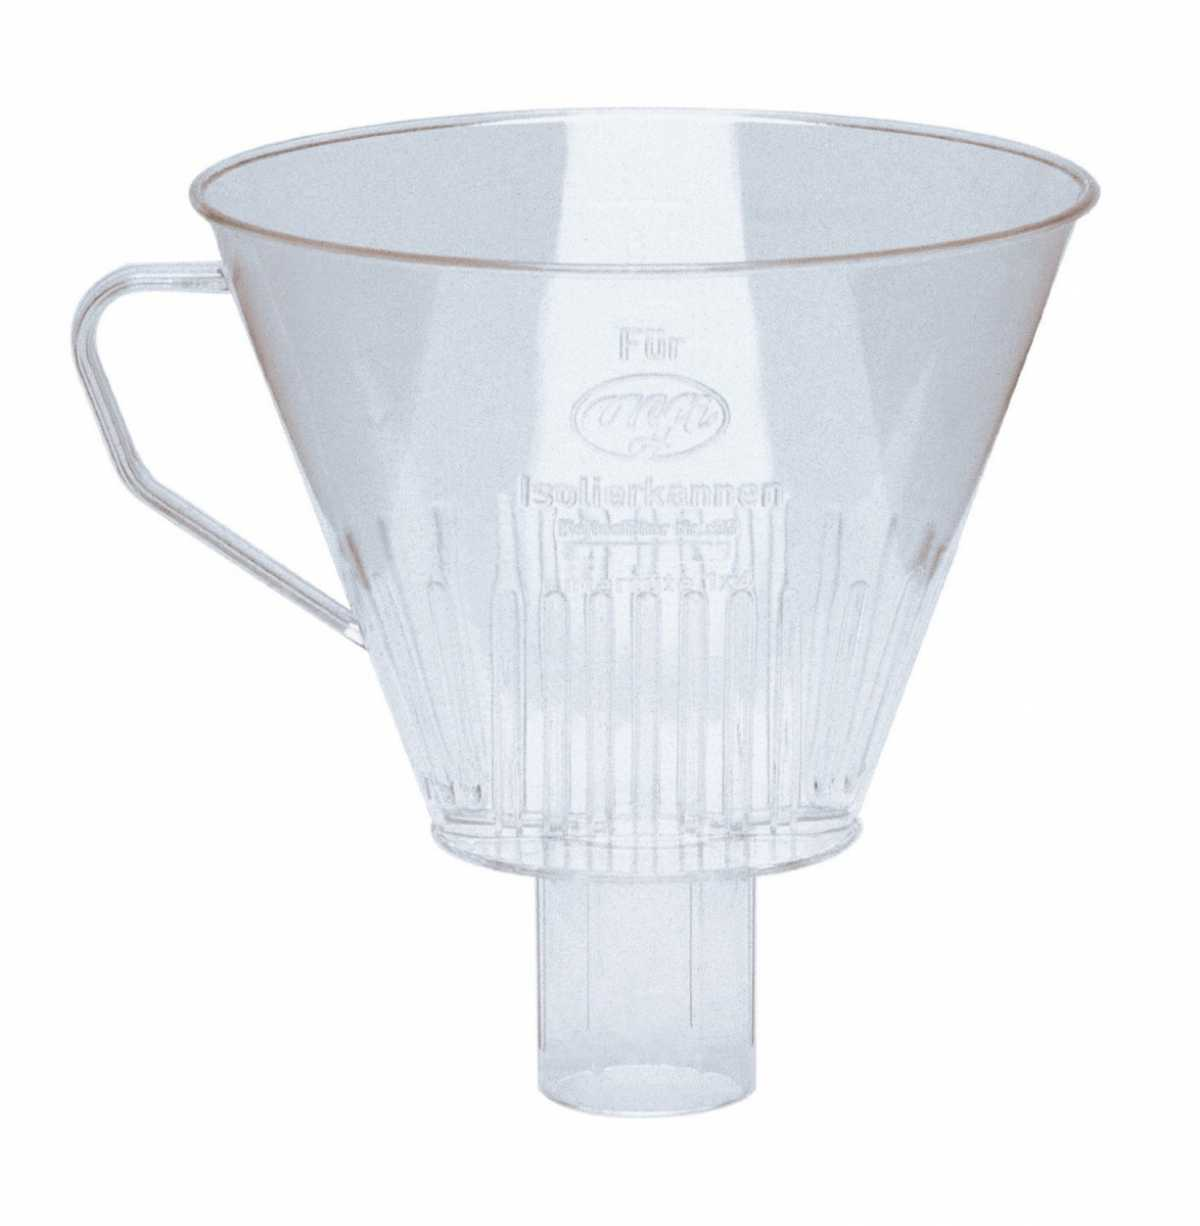 Онлайн каталог PROMENU: Фильтр для кофе Alfi                               0099 000 000